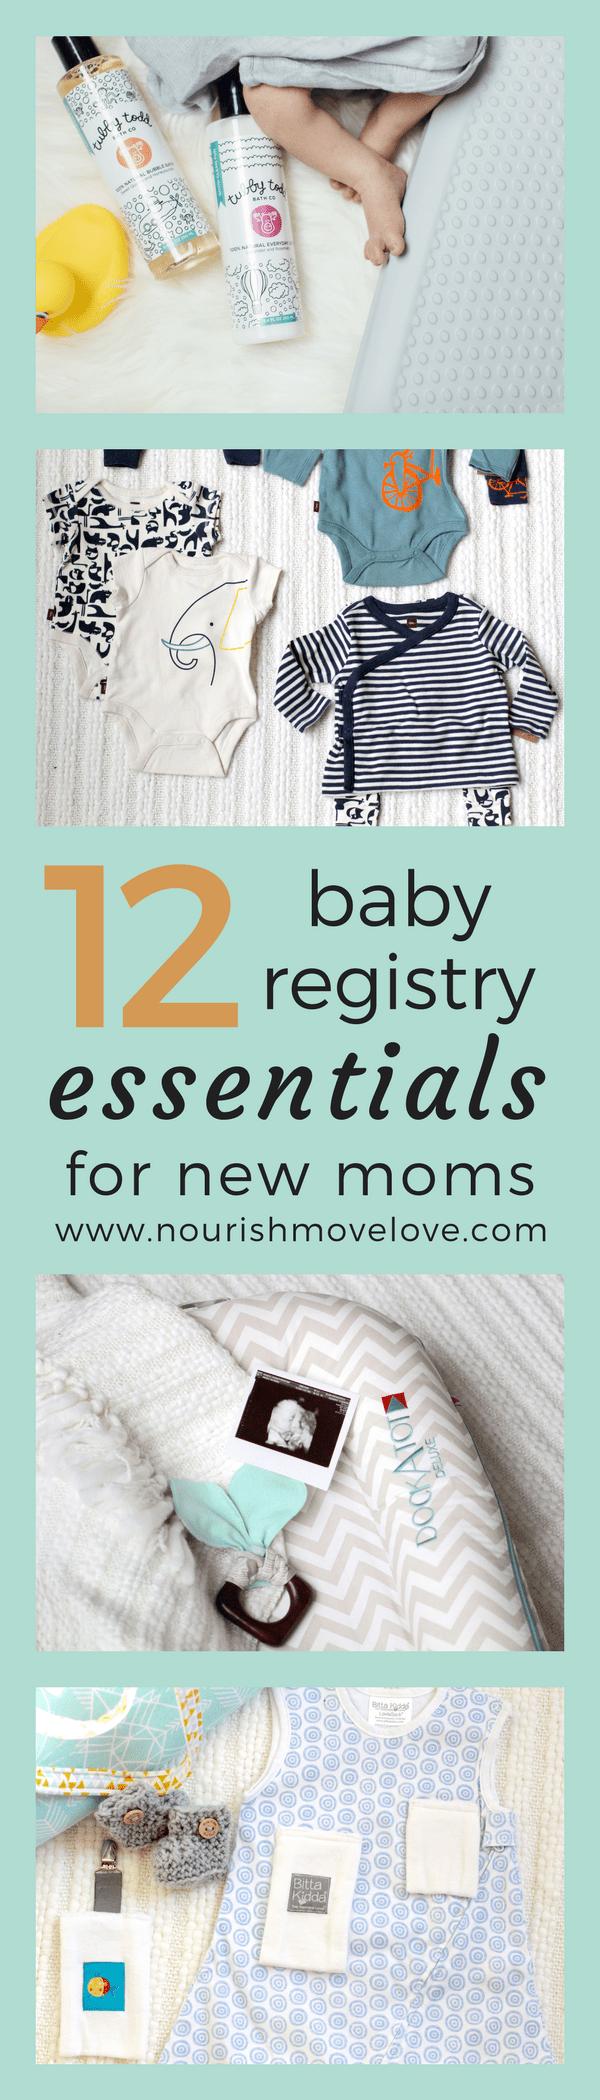 12 Baby Registry Essentials for New Moms | Nourish Move Love